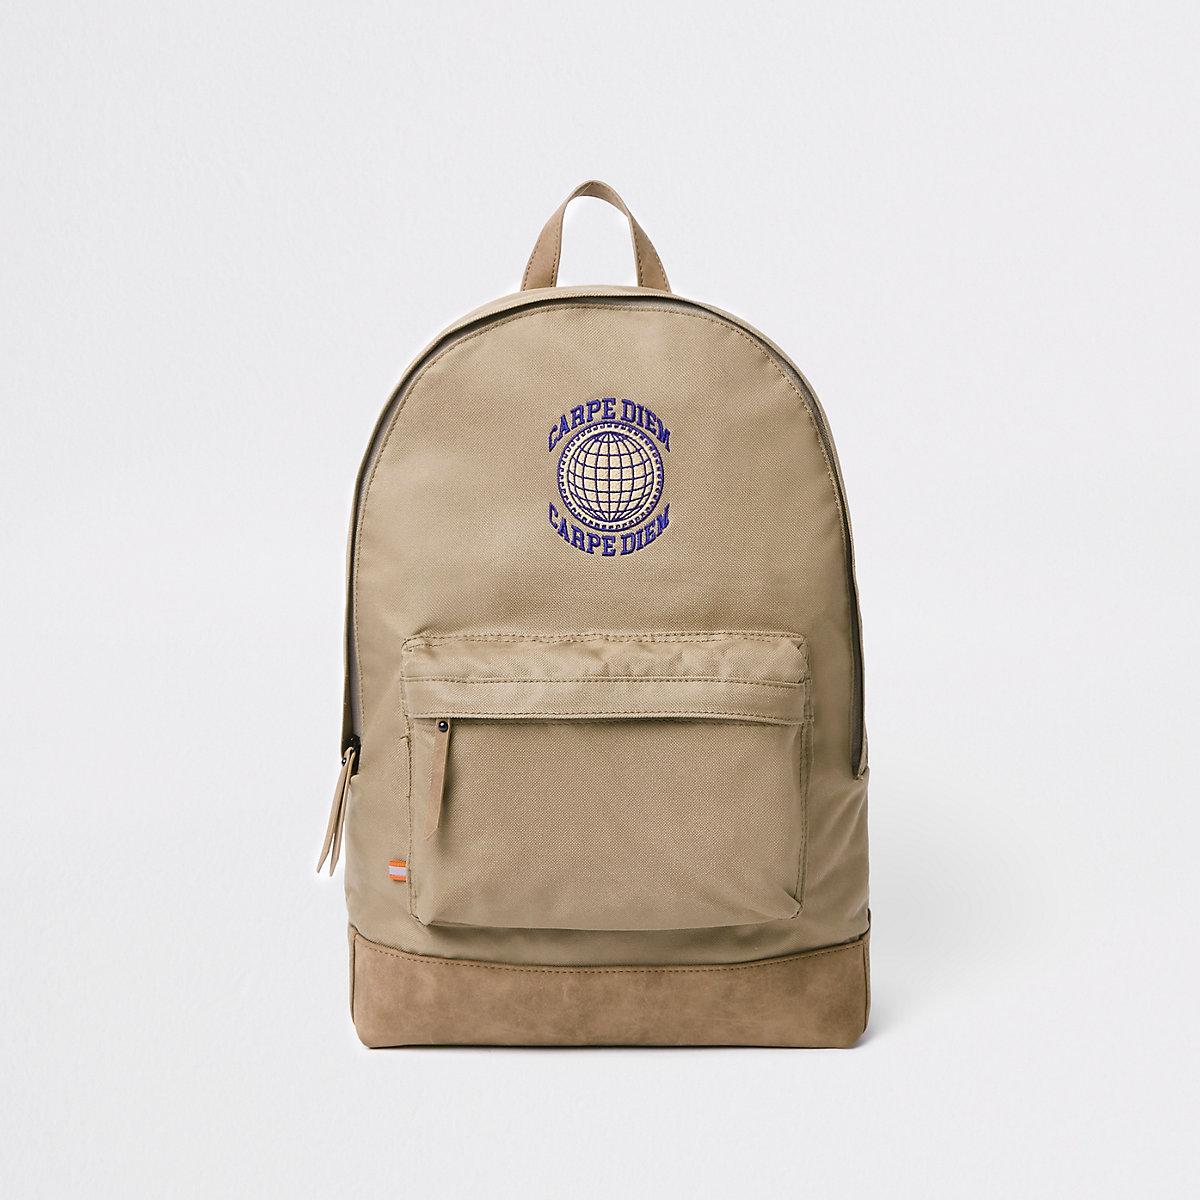 Stone 'Carpe Diem' front pocket rucksack